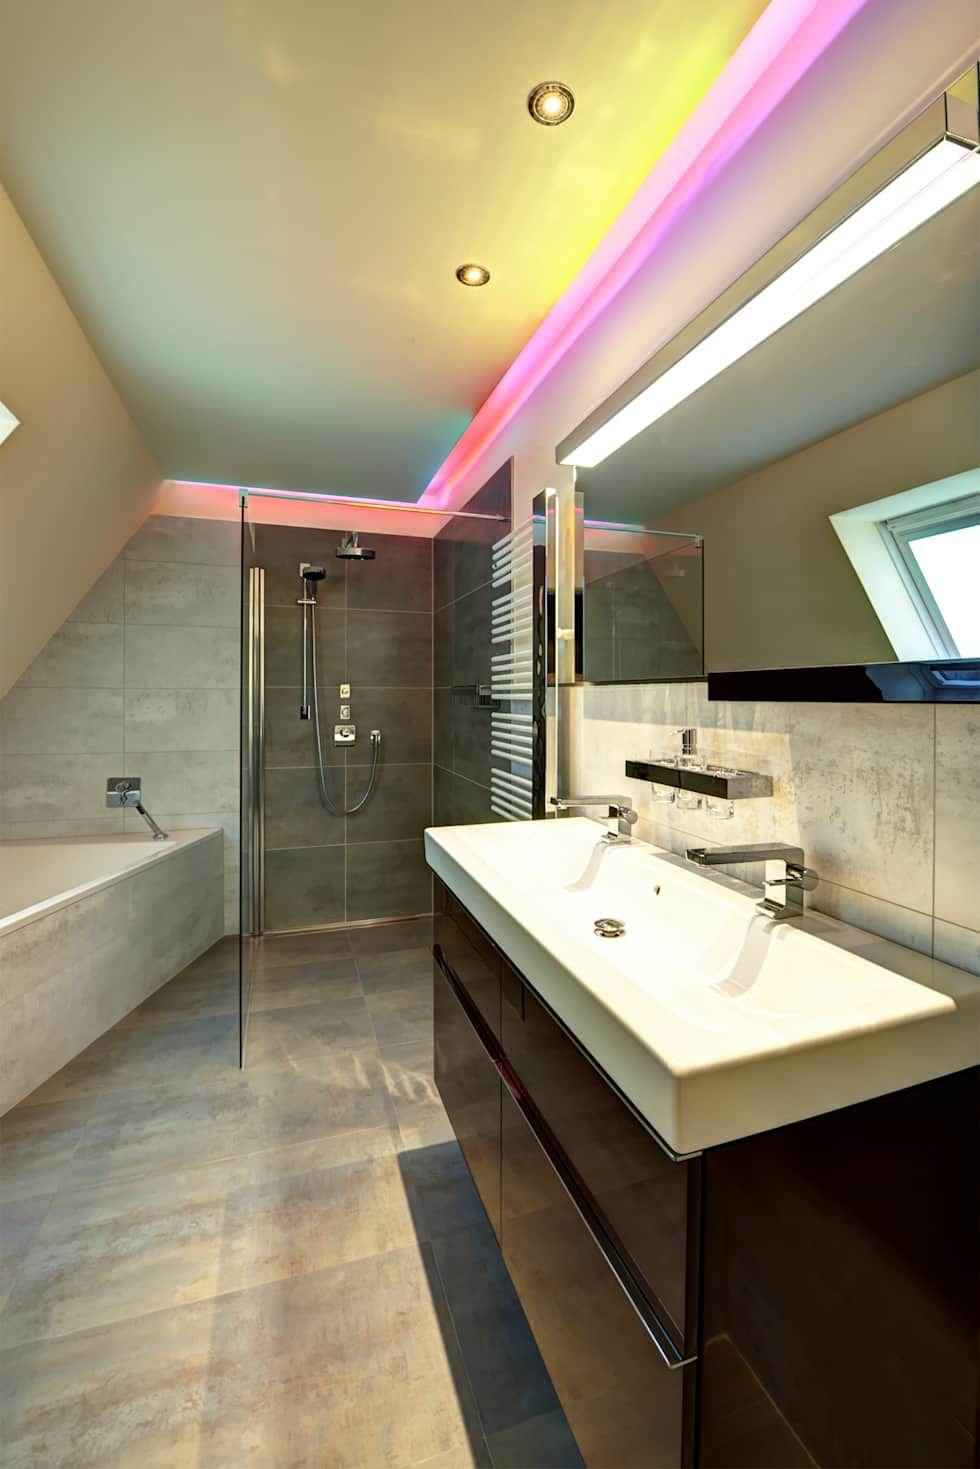 Groß Budget Küchen Badezimmer Sydney Ideen - Küche Set Ideen ...